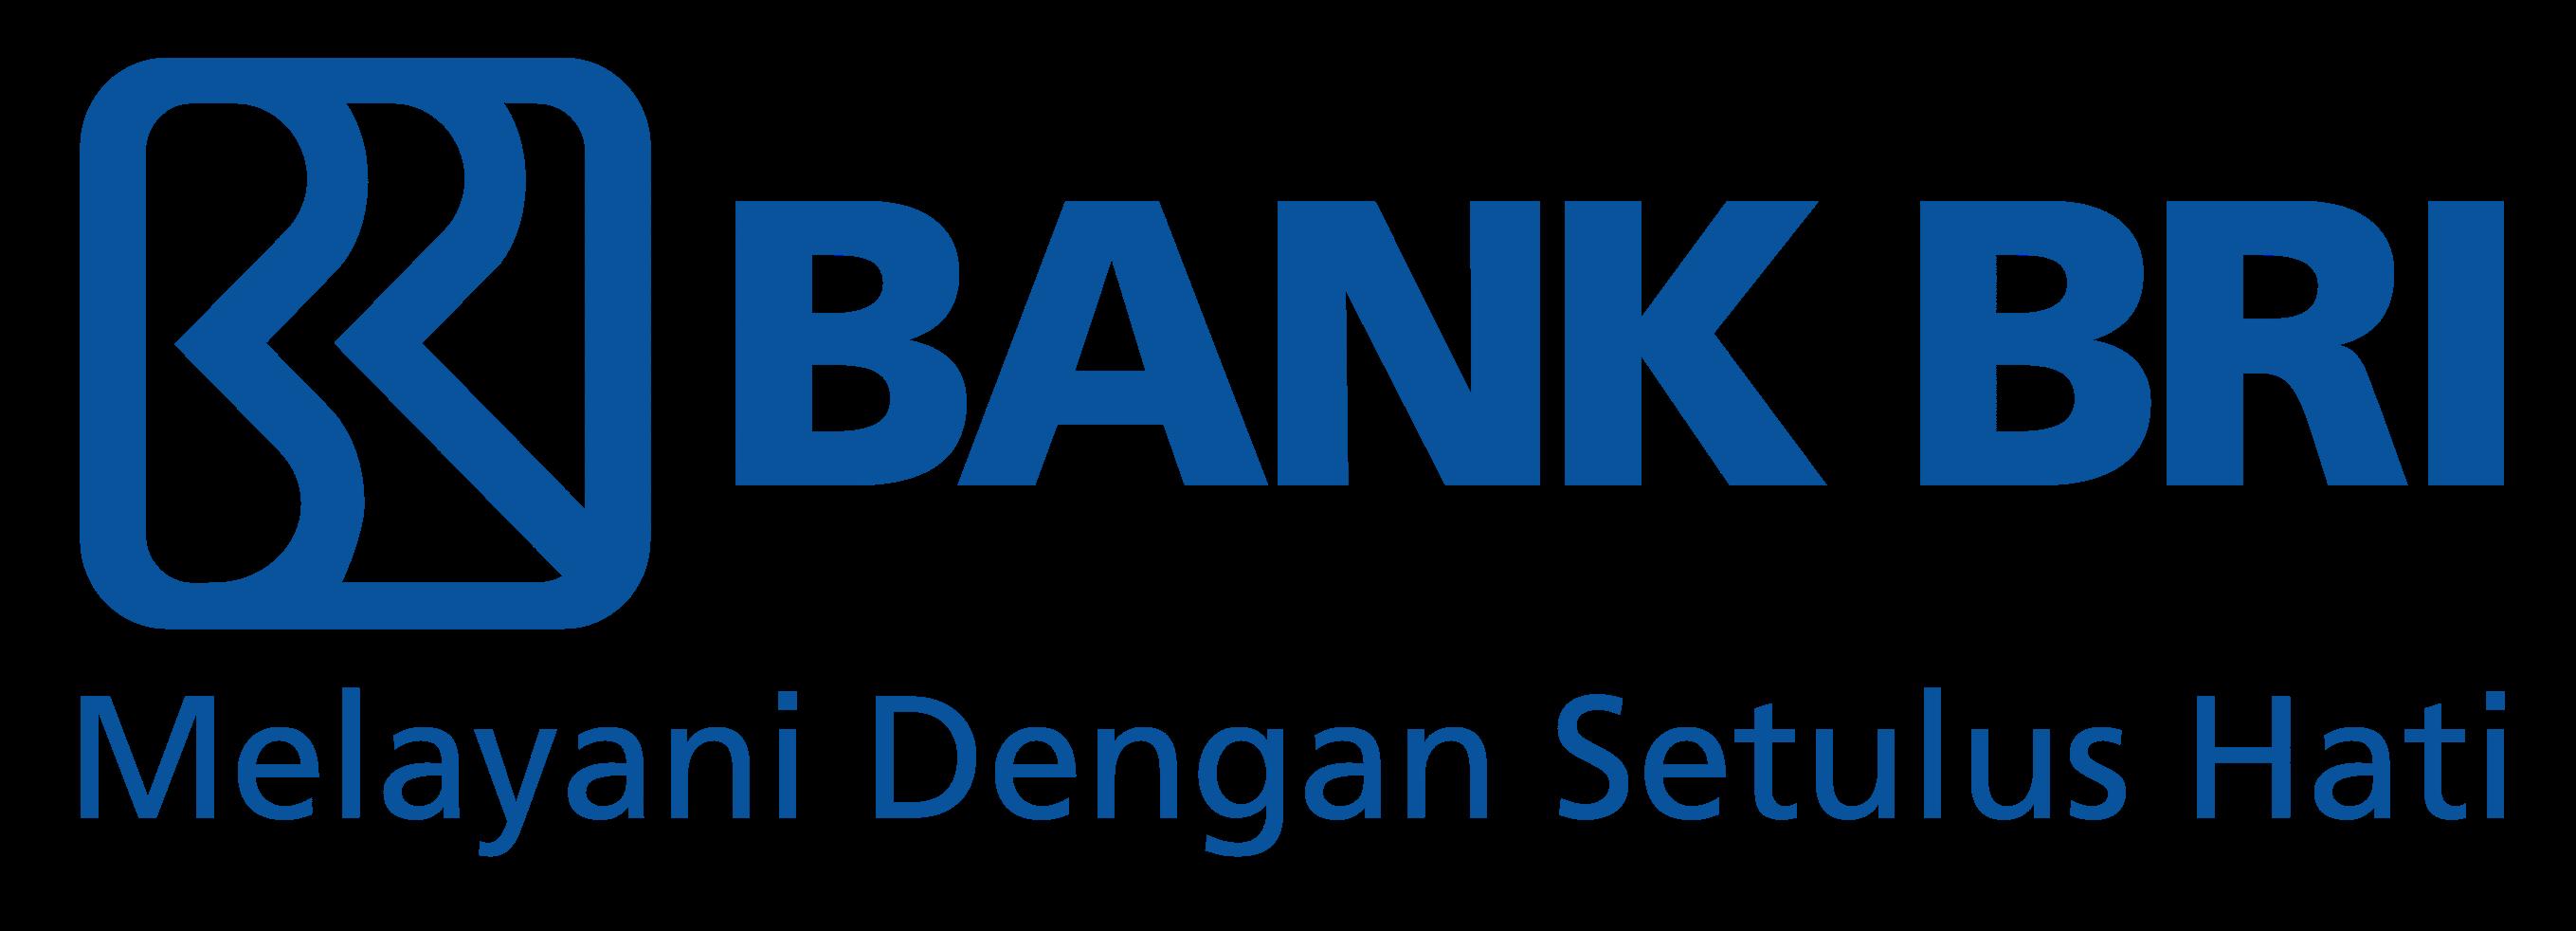 Bank Bri Bank Rakyat Indonesia Logos Download